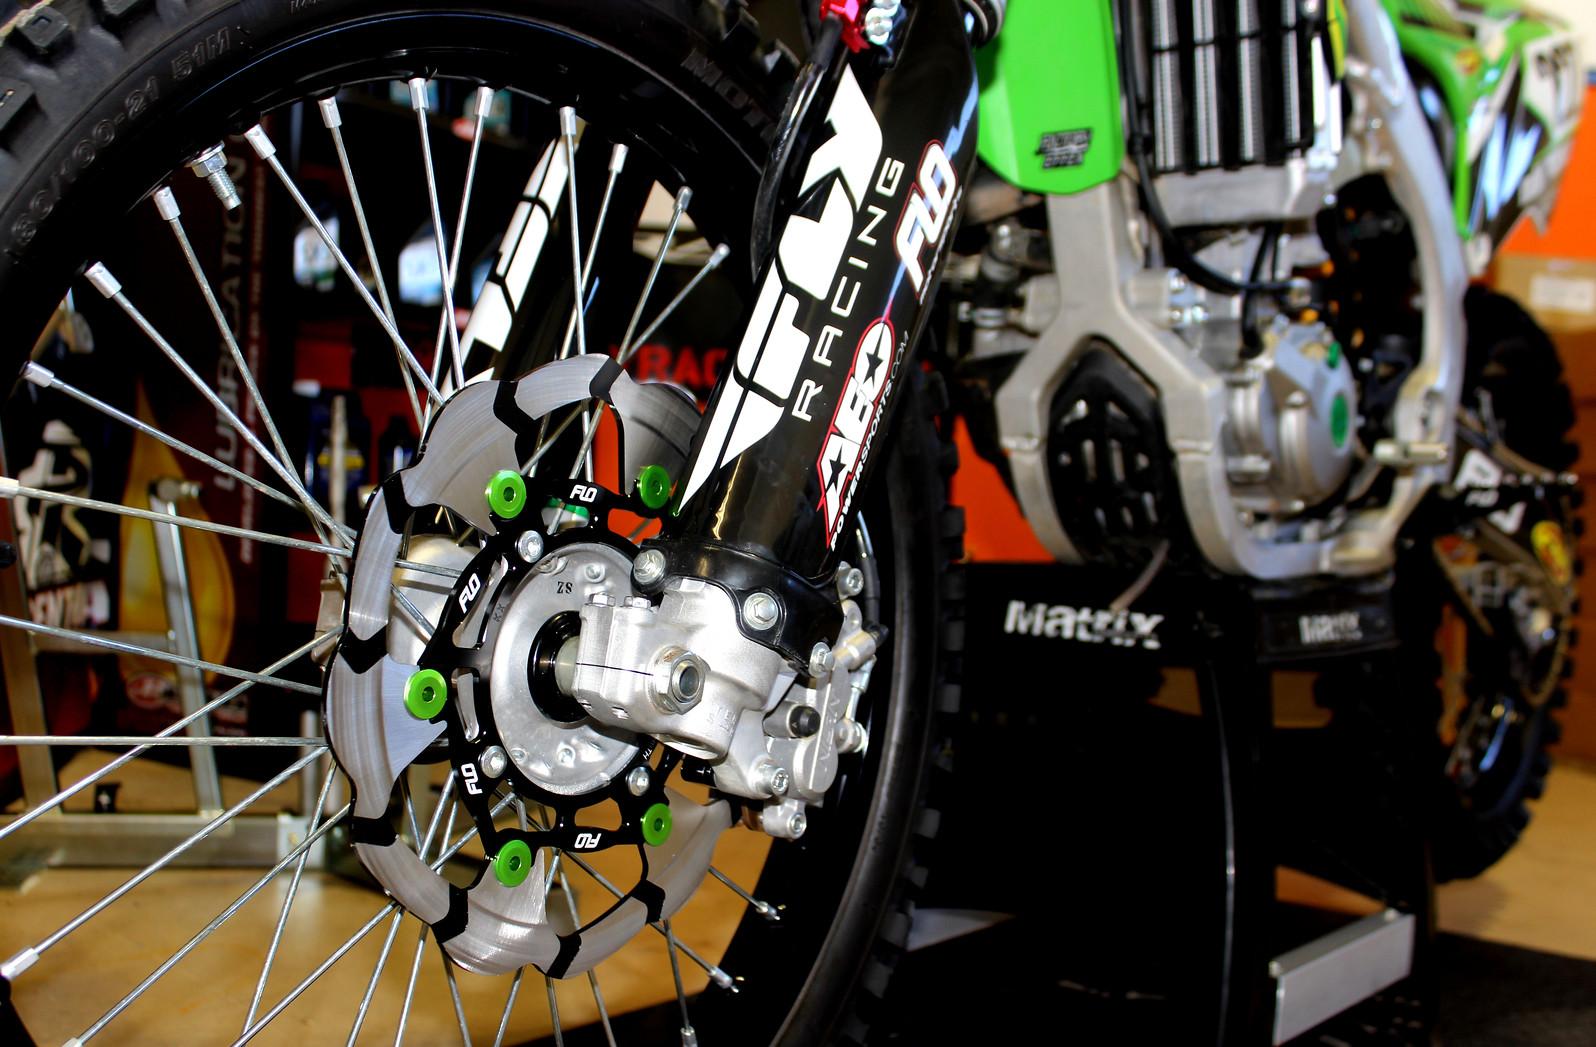 Flo Motorsports 270mm Floating Brake Rotor  rotor on bike 4